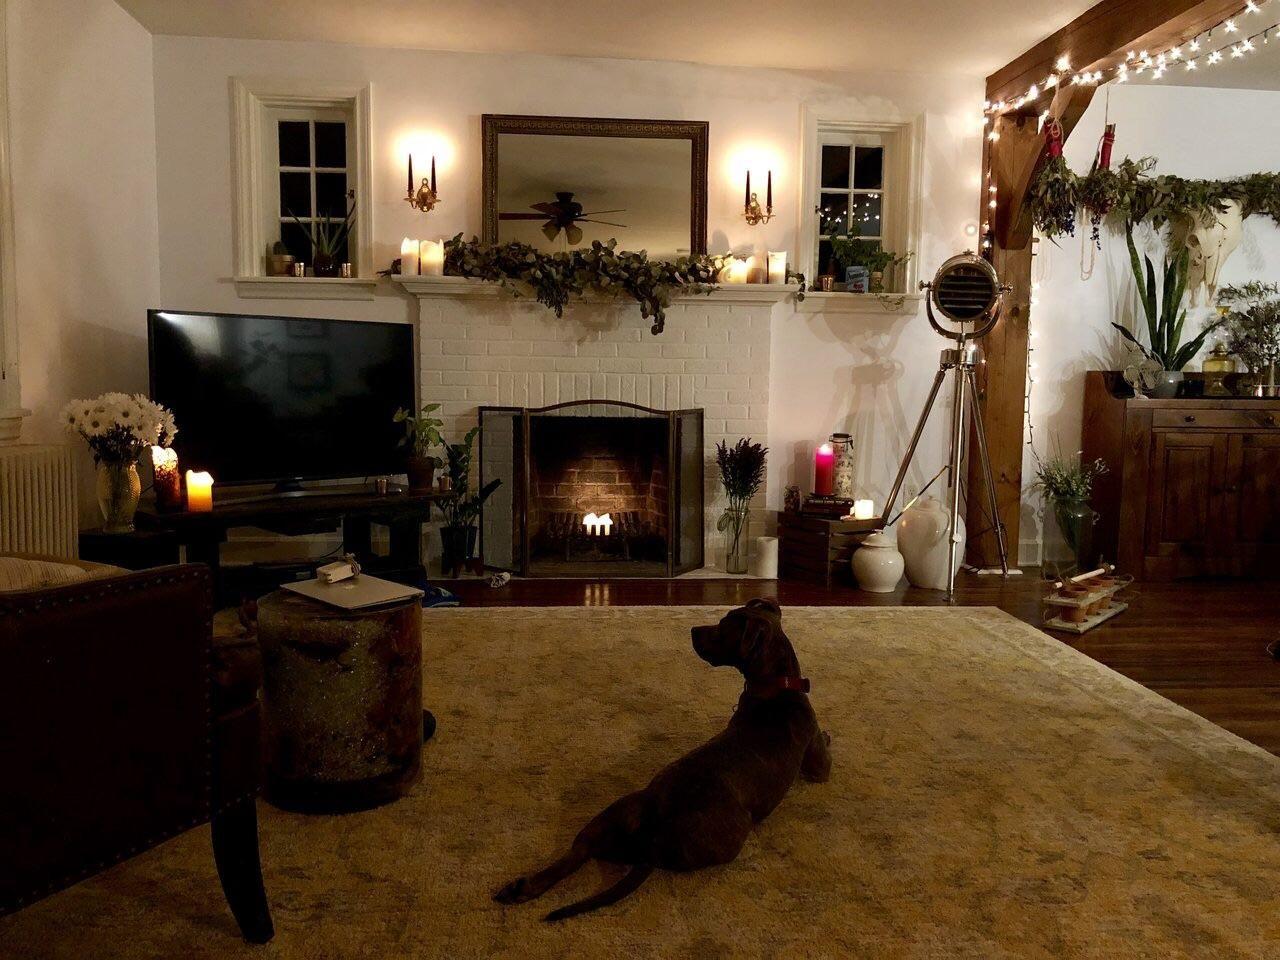 Our Living Room Halloween Evening Lancaster Pennsylvania 1280x960 Https Ift Tt 2jssbfh Cozy House Room Dorm